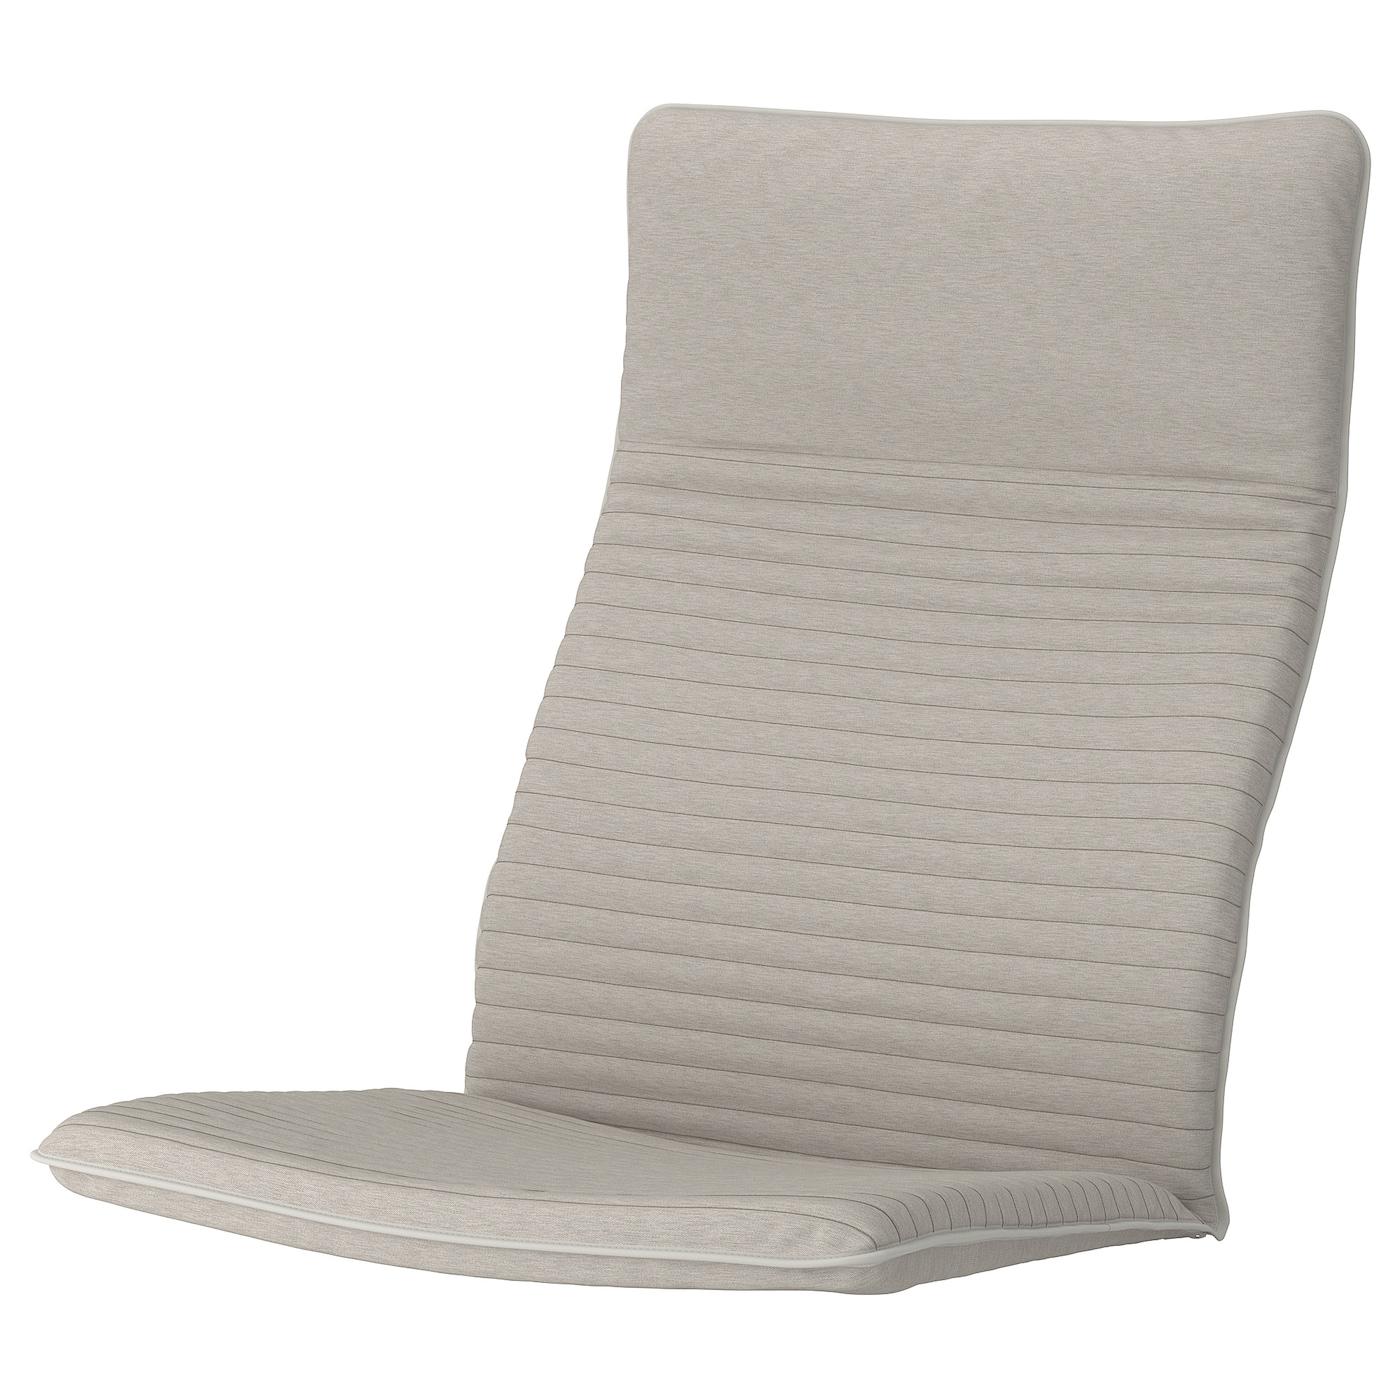 Cushion Only Knisa Orange red//Orange IKEA POANG Chair Cushion